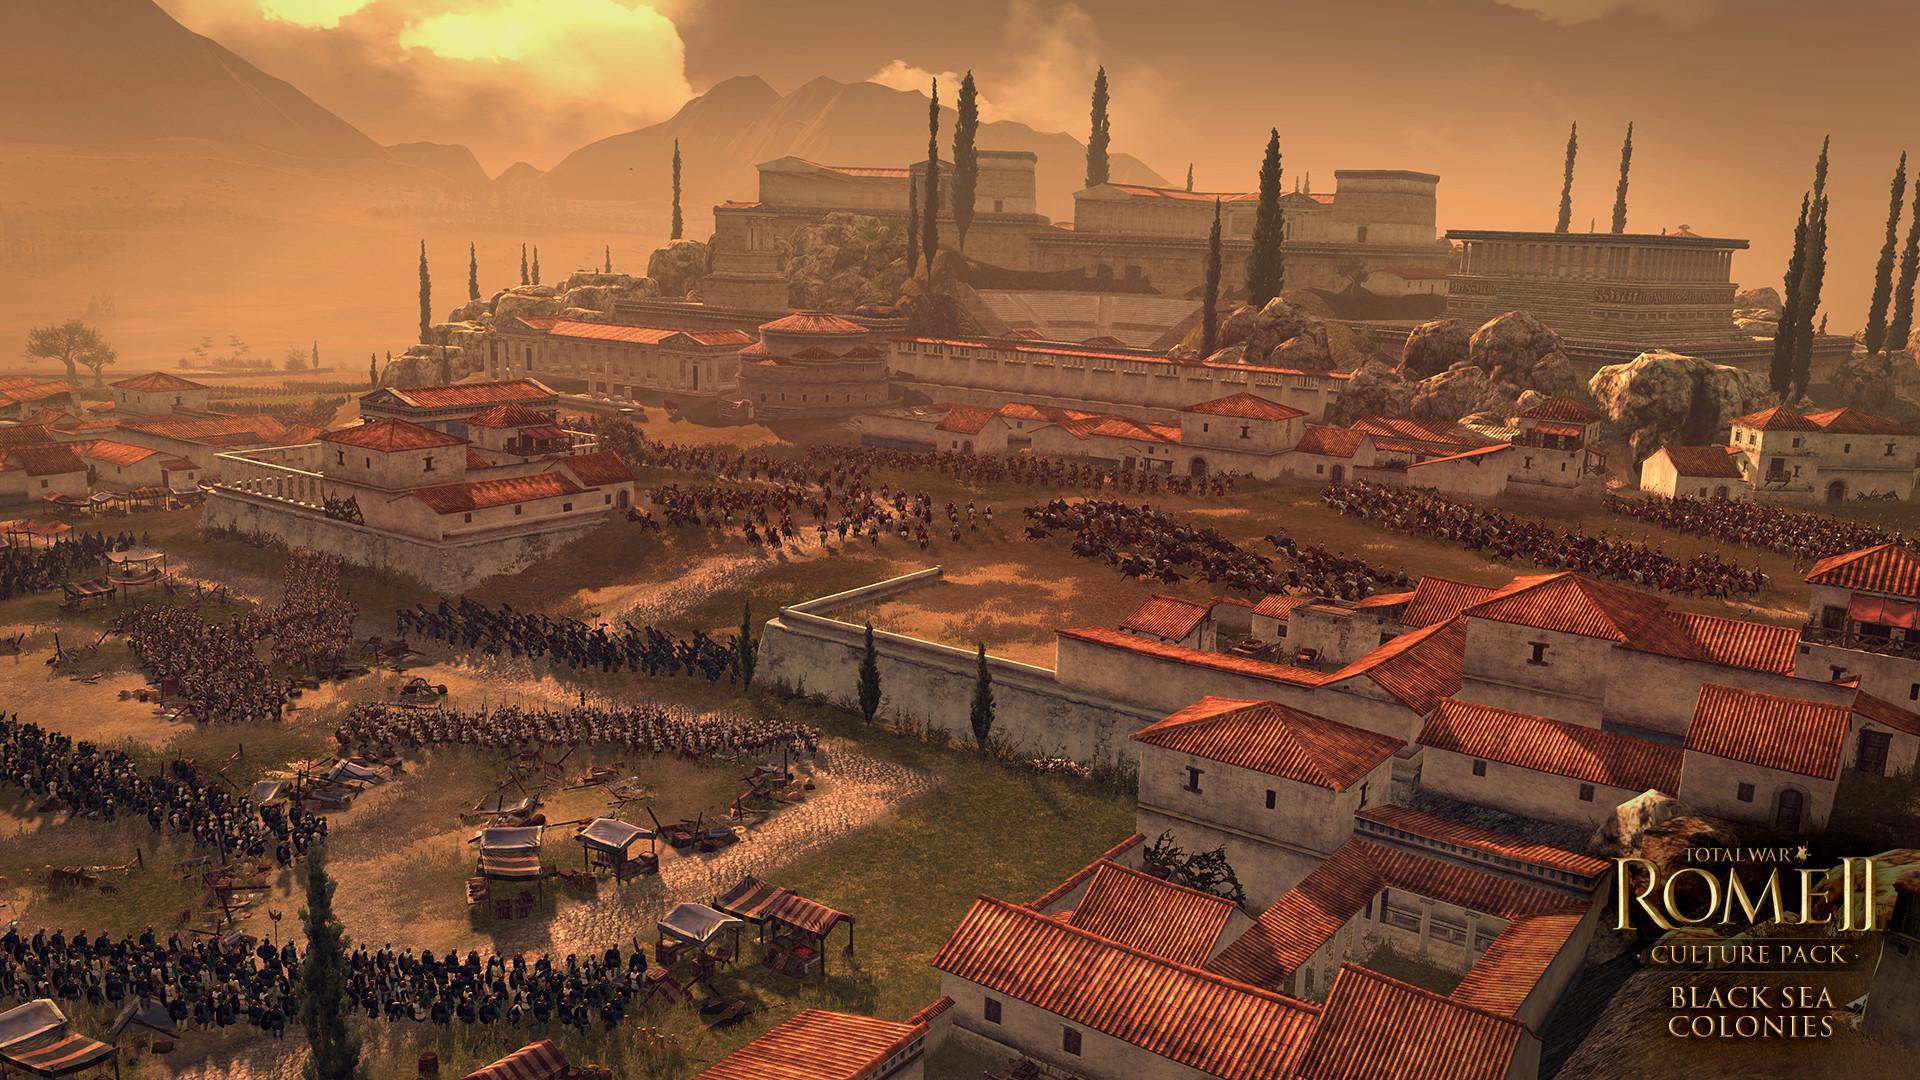 Total War: ROME II - Black Sea Colonies Culture Pack on Steam